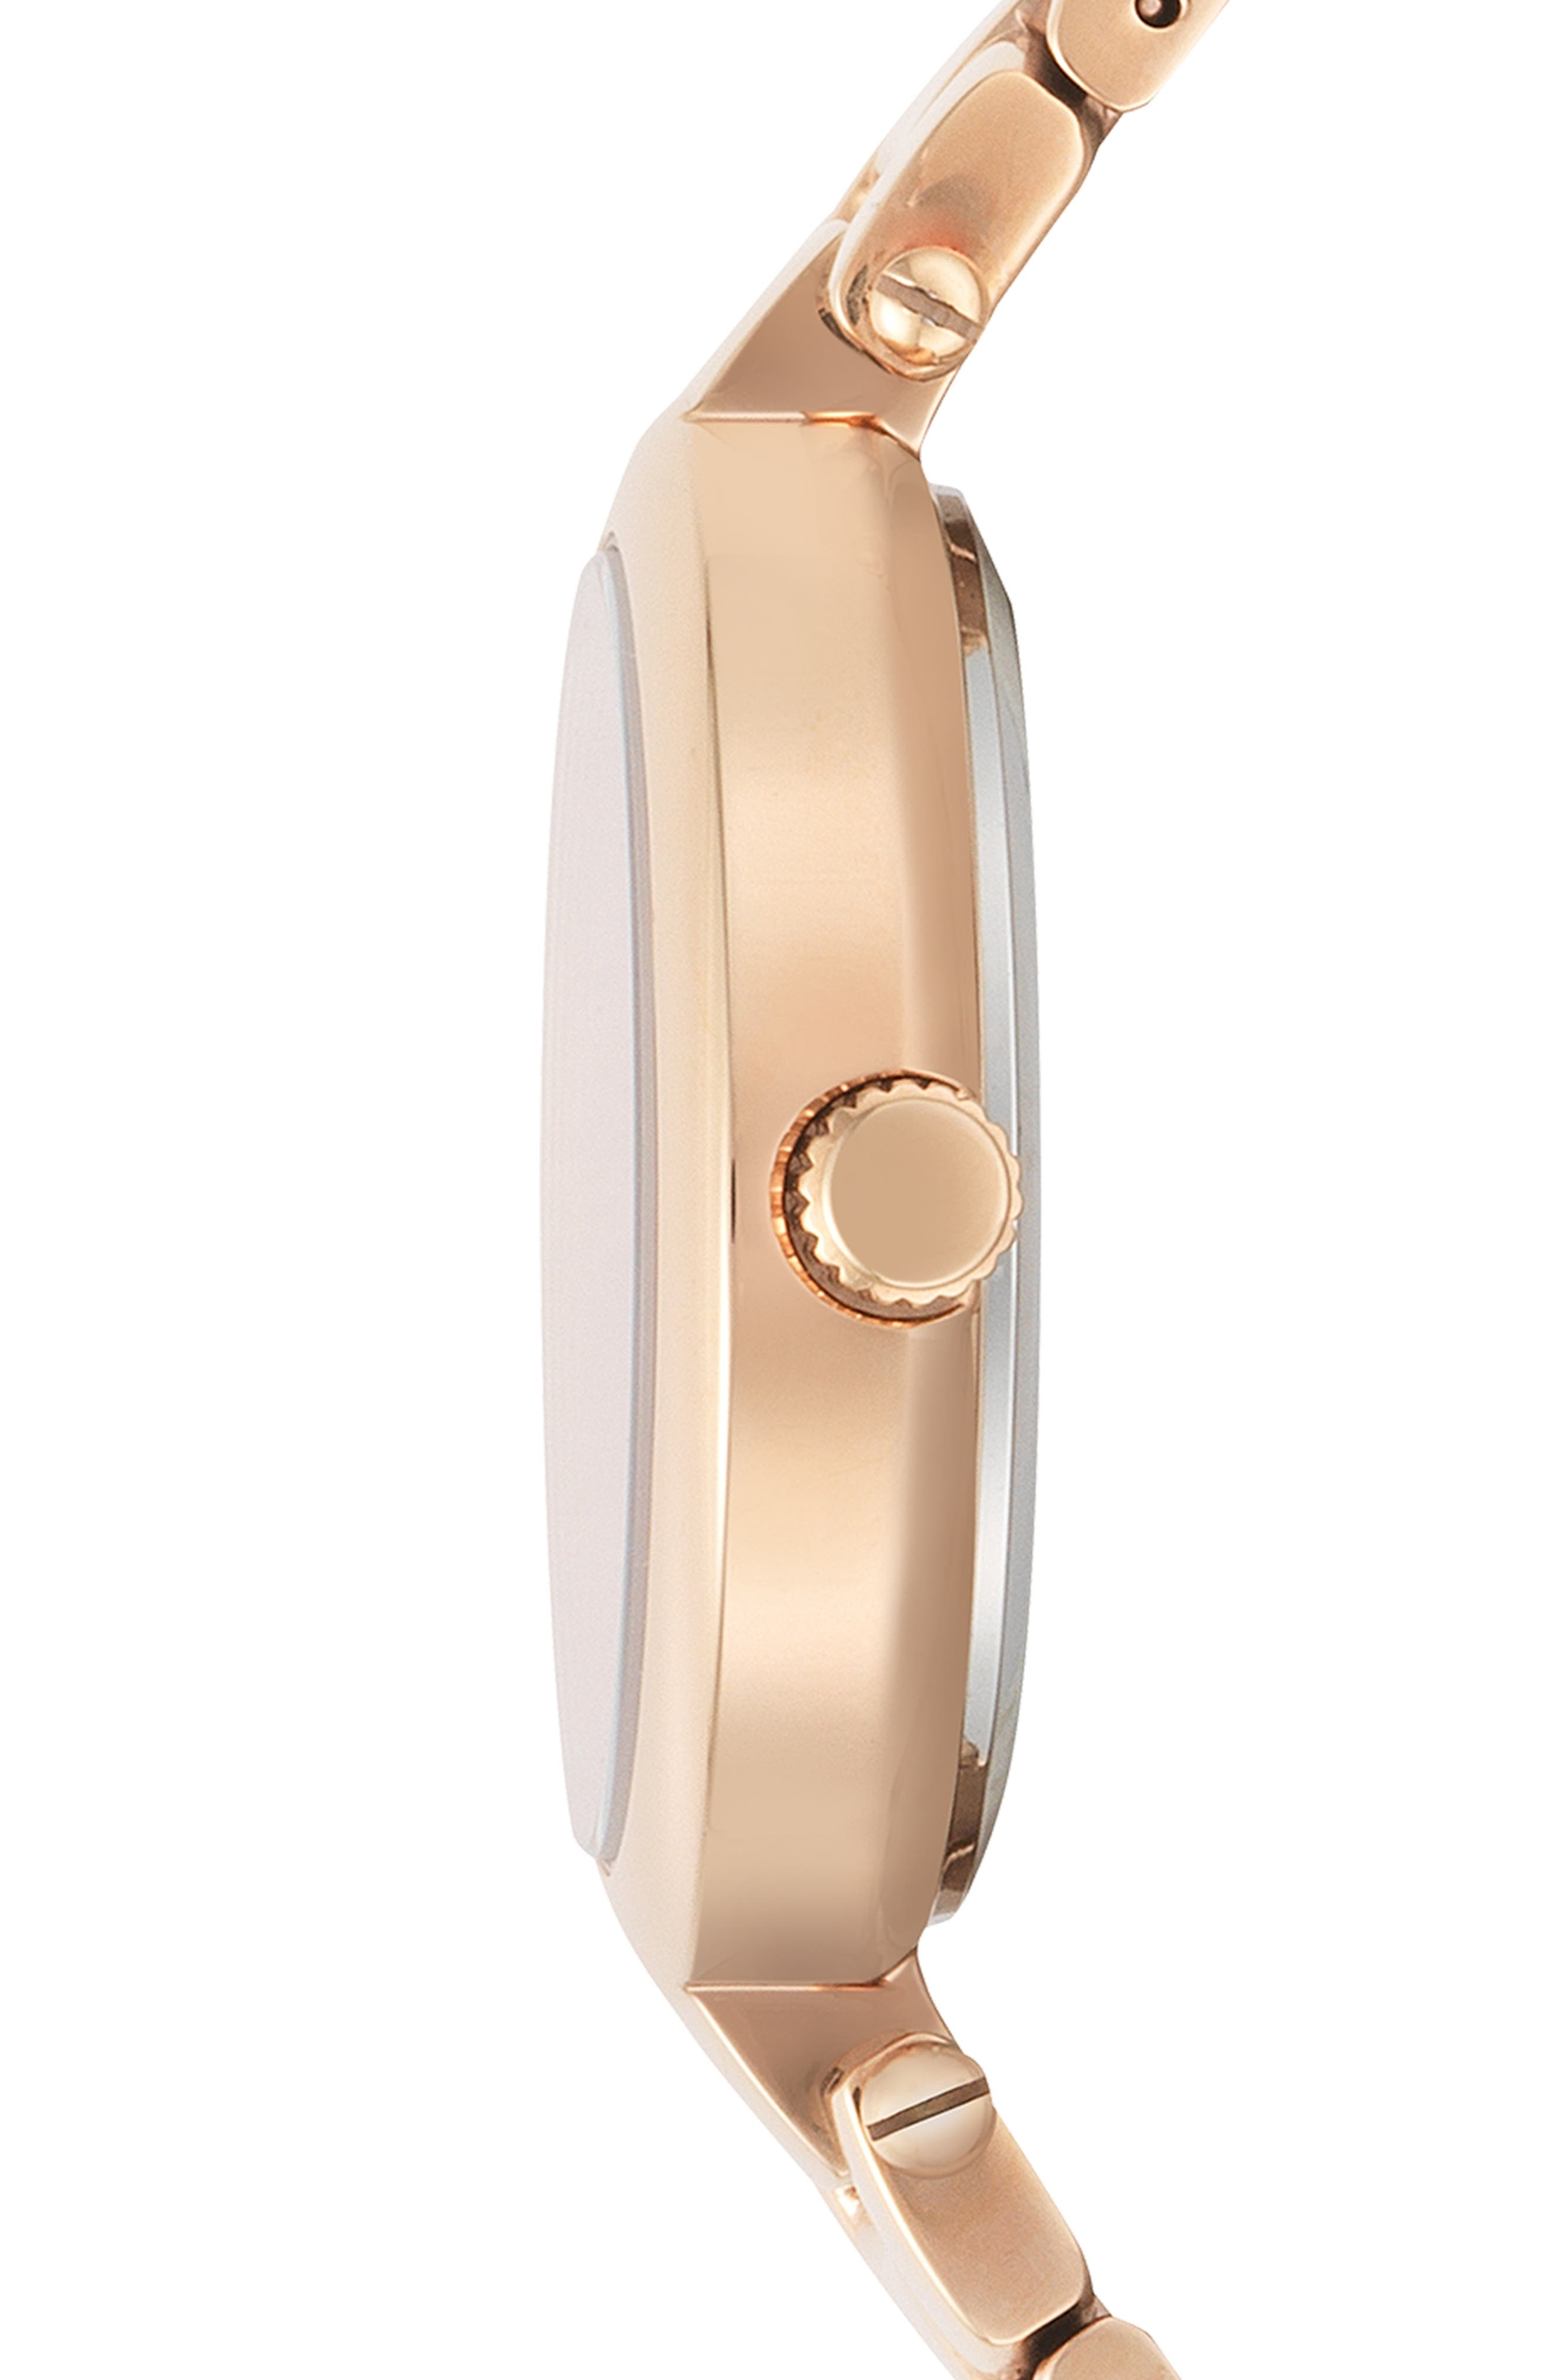 VERSUS VERSACE, Buffle Bay Bracelet Watch, 36mm, Alternate thumbnail 2, color, ROSE GOLD/ RED